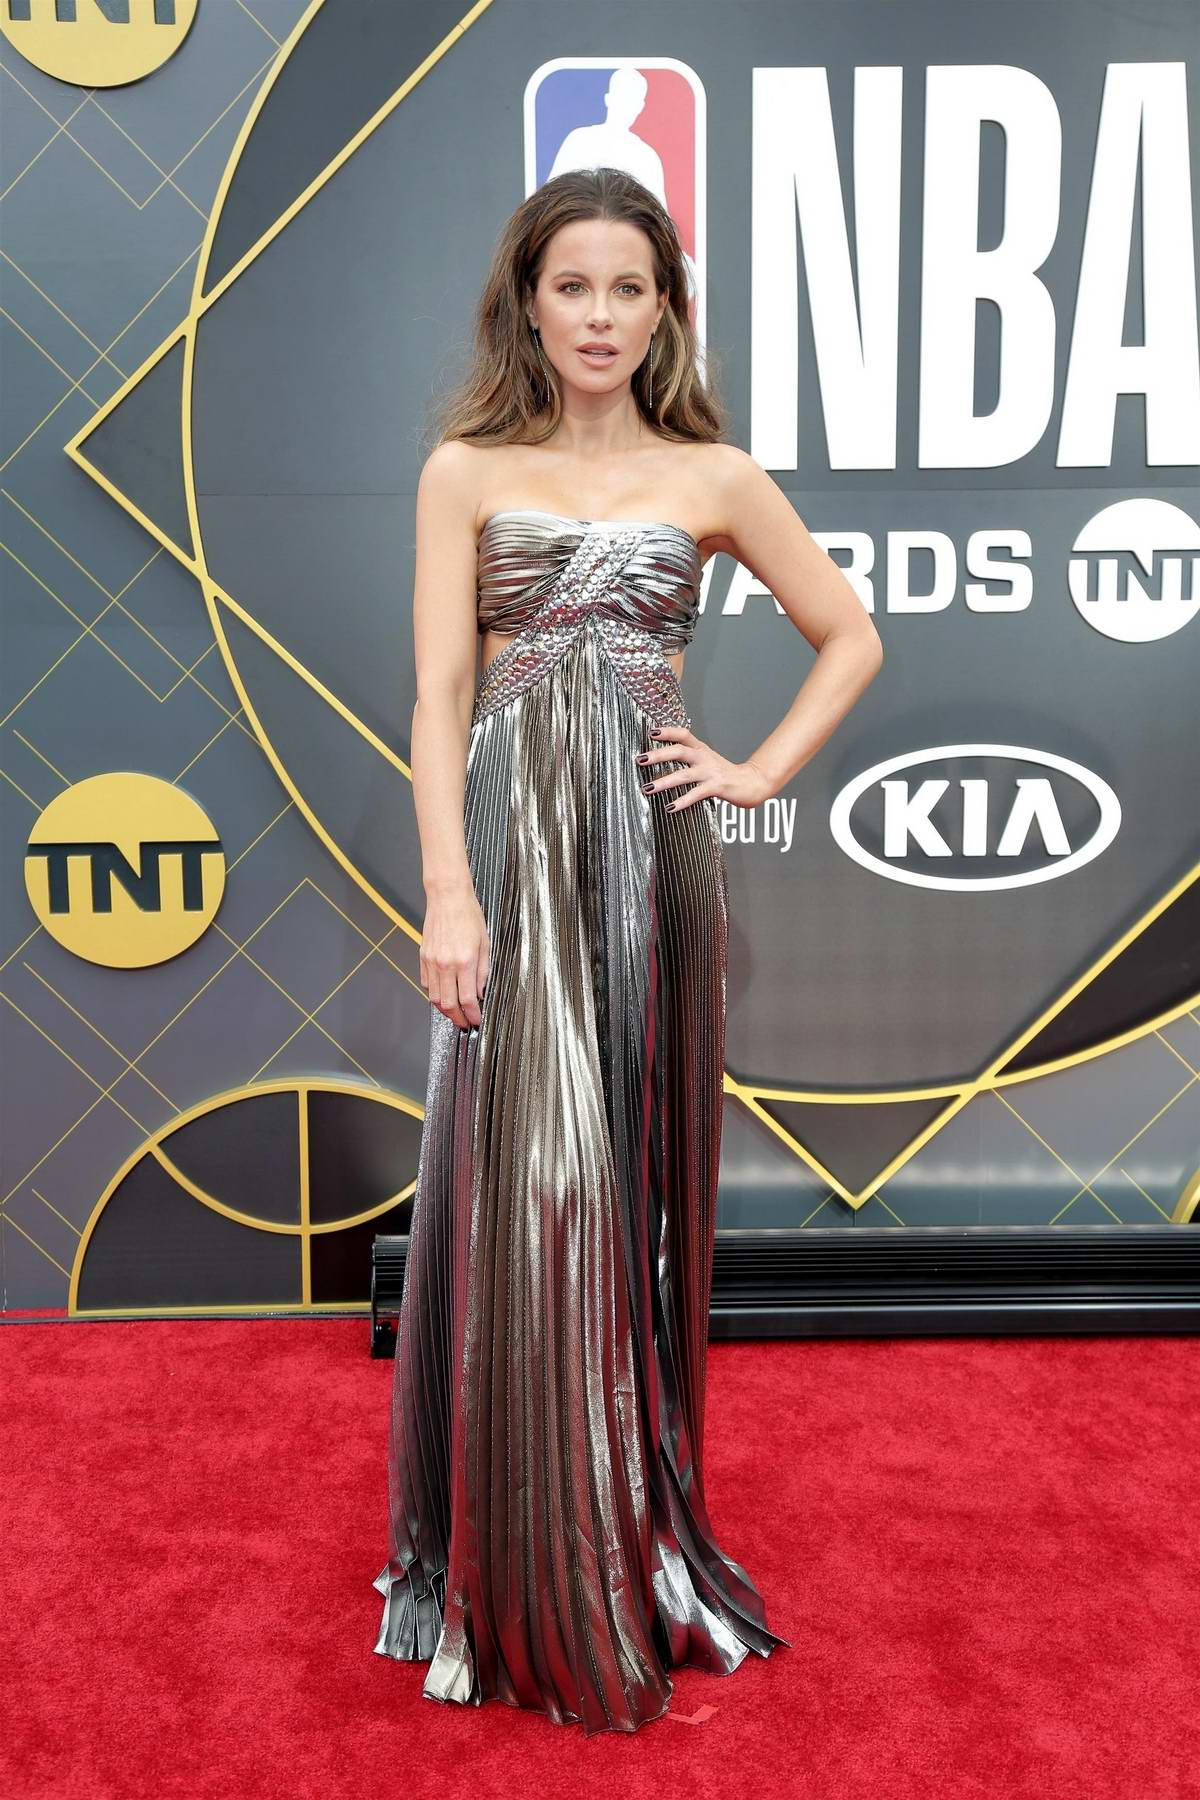 Kate Beckinsale attends the 2019 NBA Awards held at Barker Hangar in Santa Monica, California